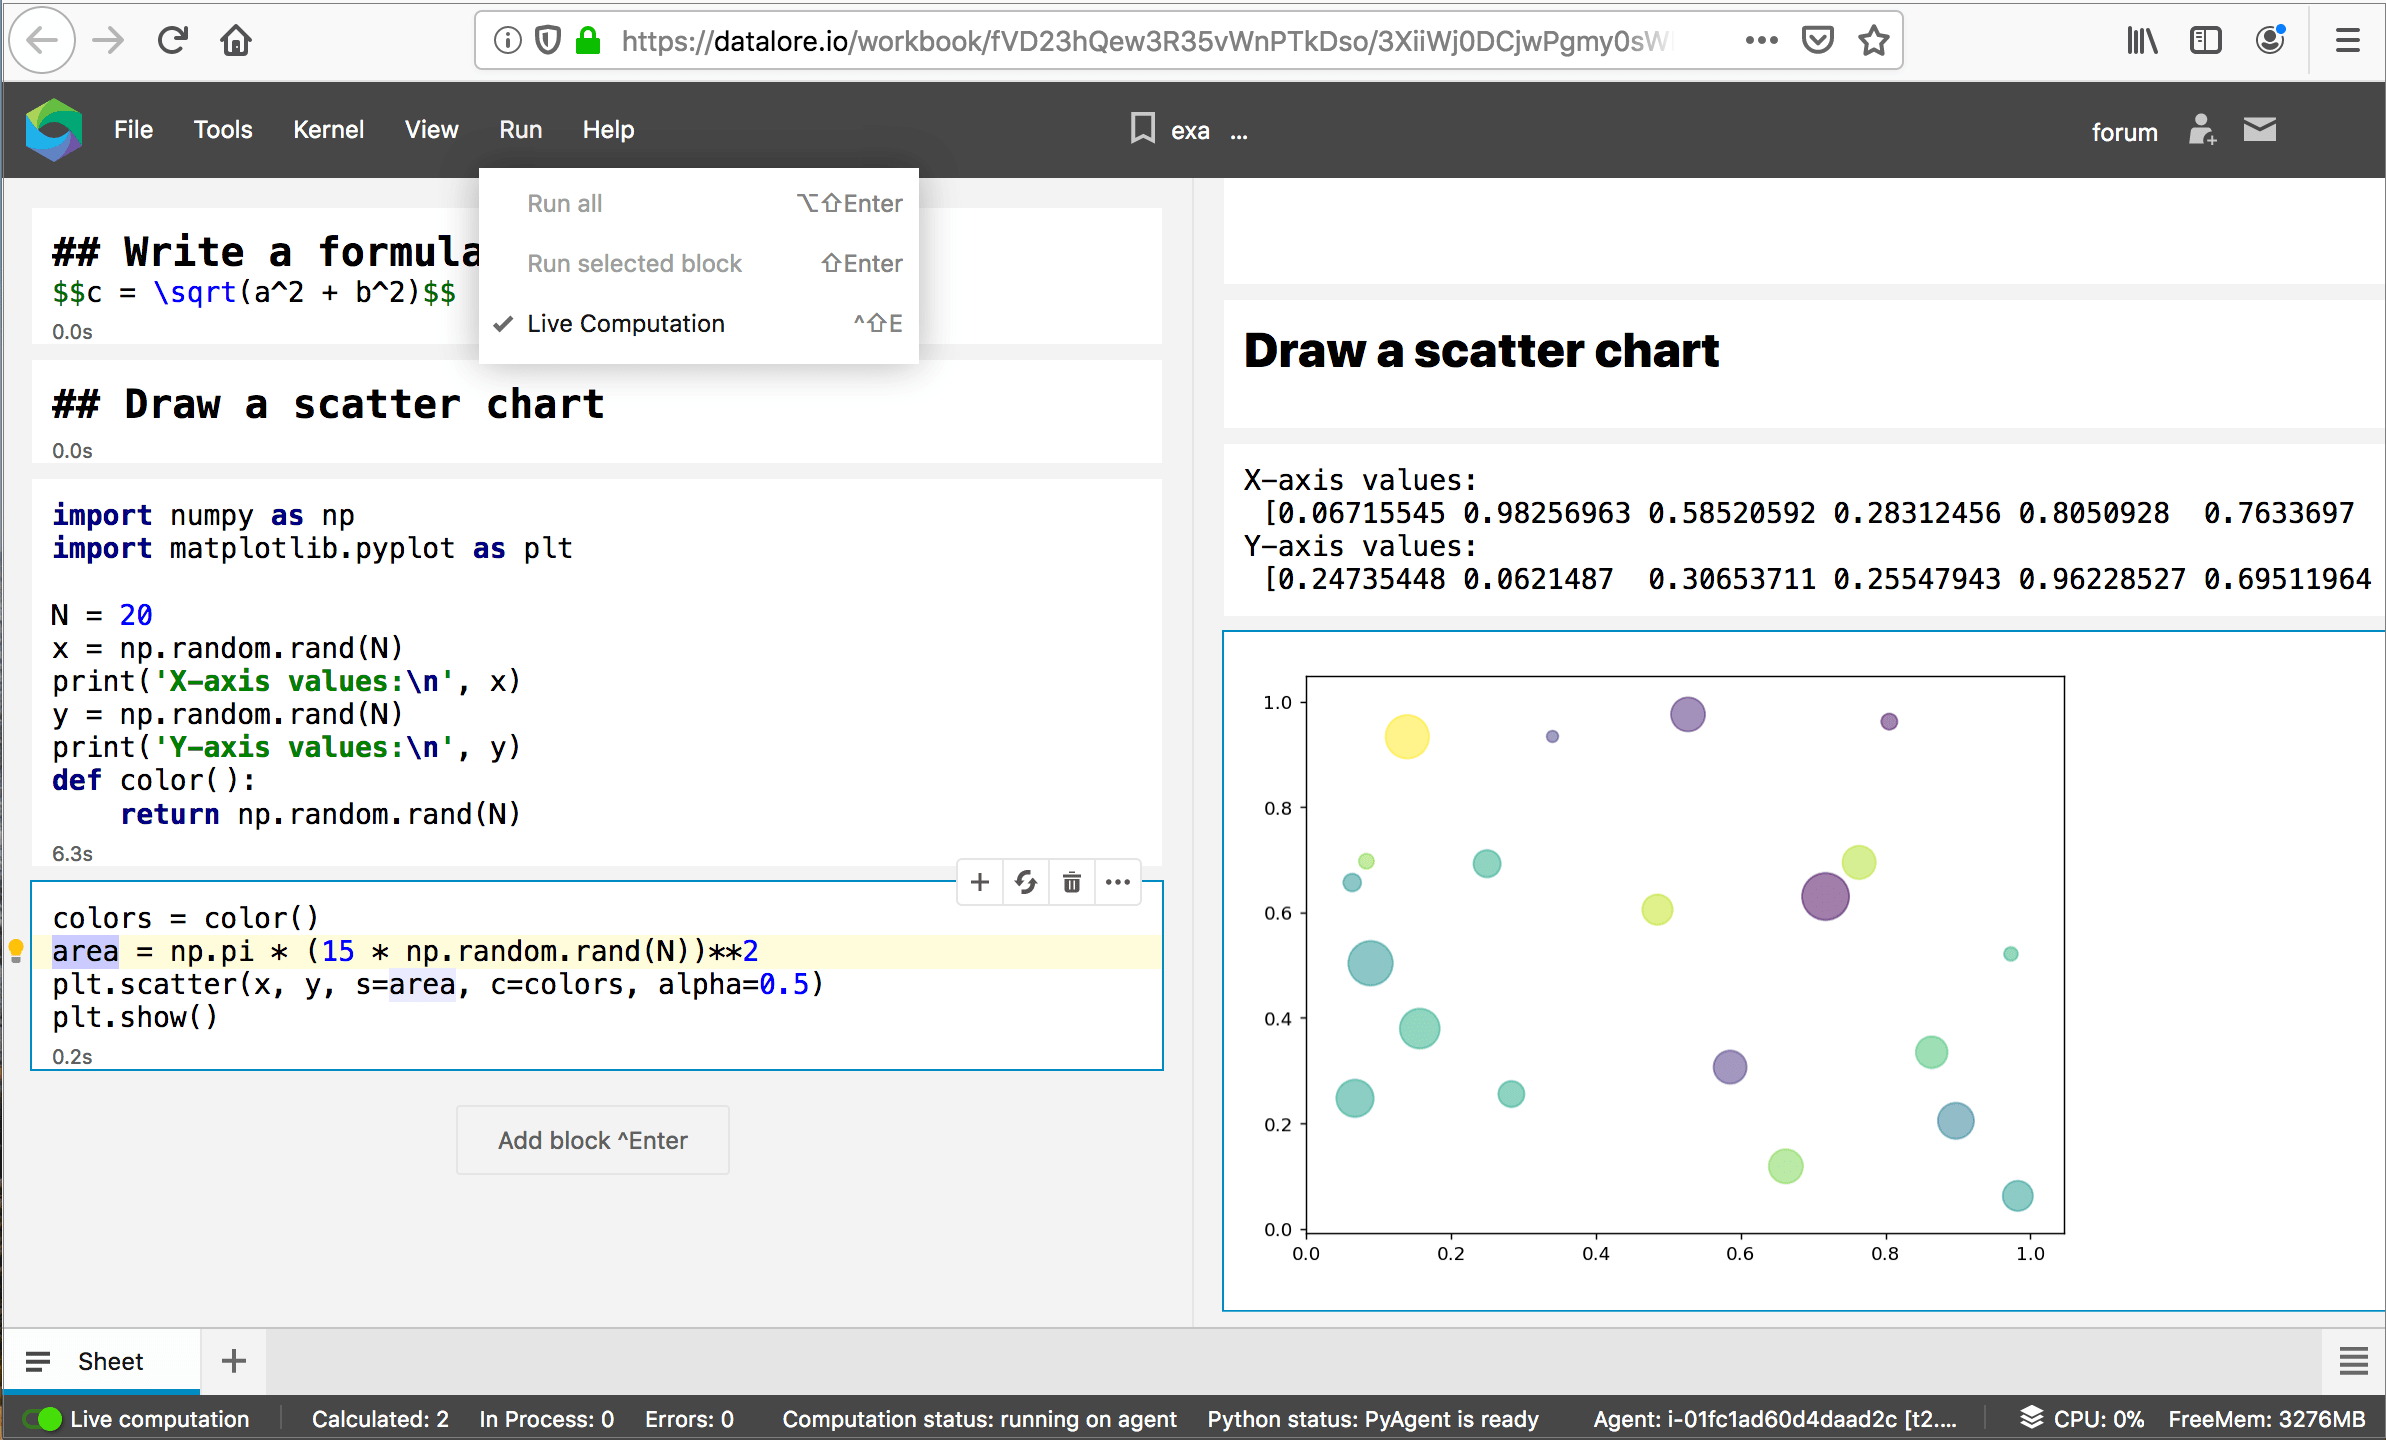 Running a notebook in Datalore